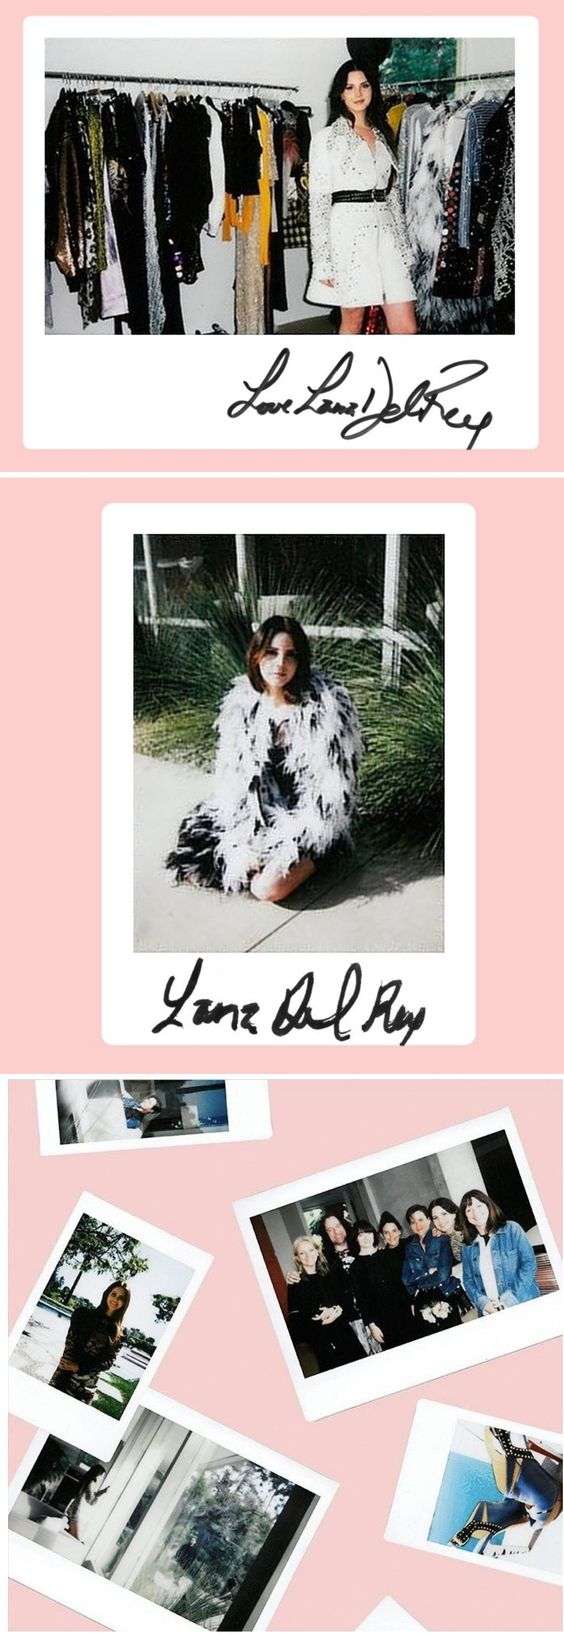 Lana Del Rey behind the scenes of photoshoot for Elle UK (June 2017) #LDR: